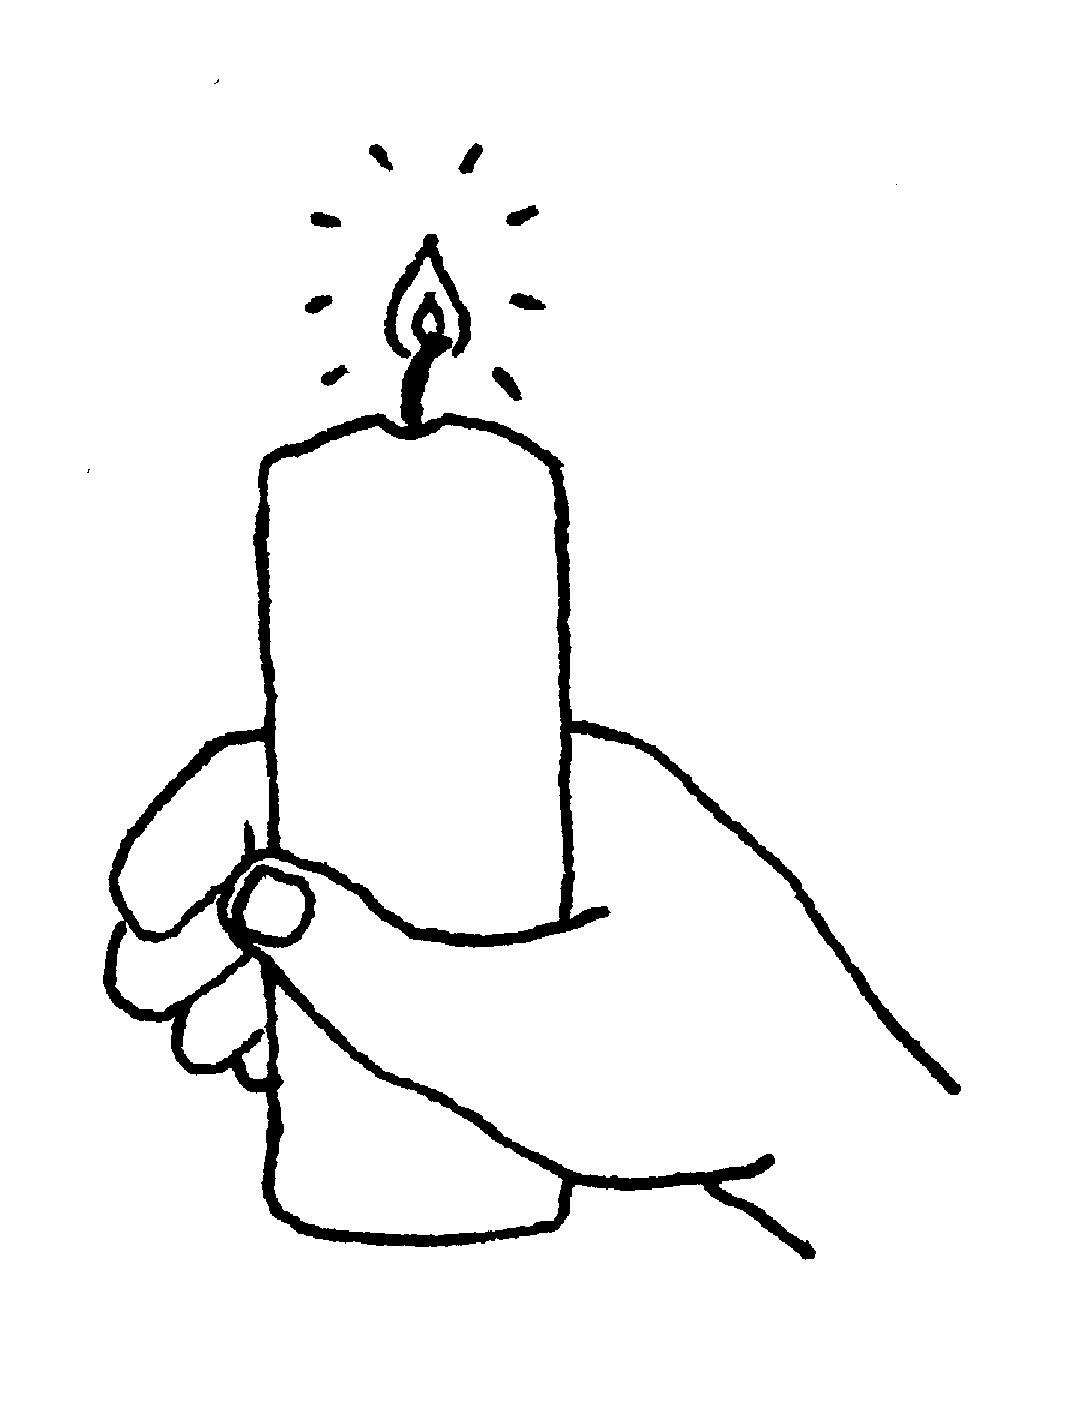 Remembrancetide reverend ally holding. Candles clipart line art